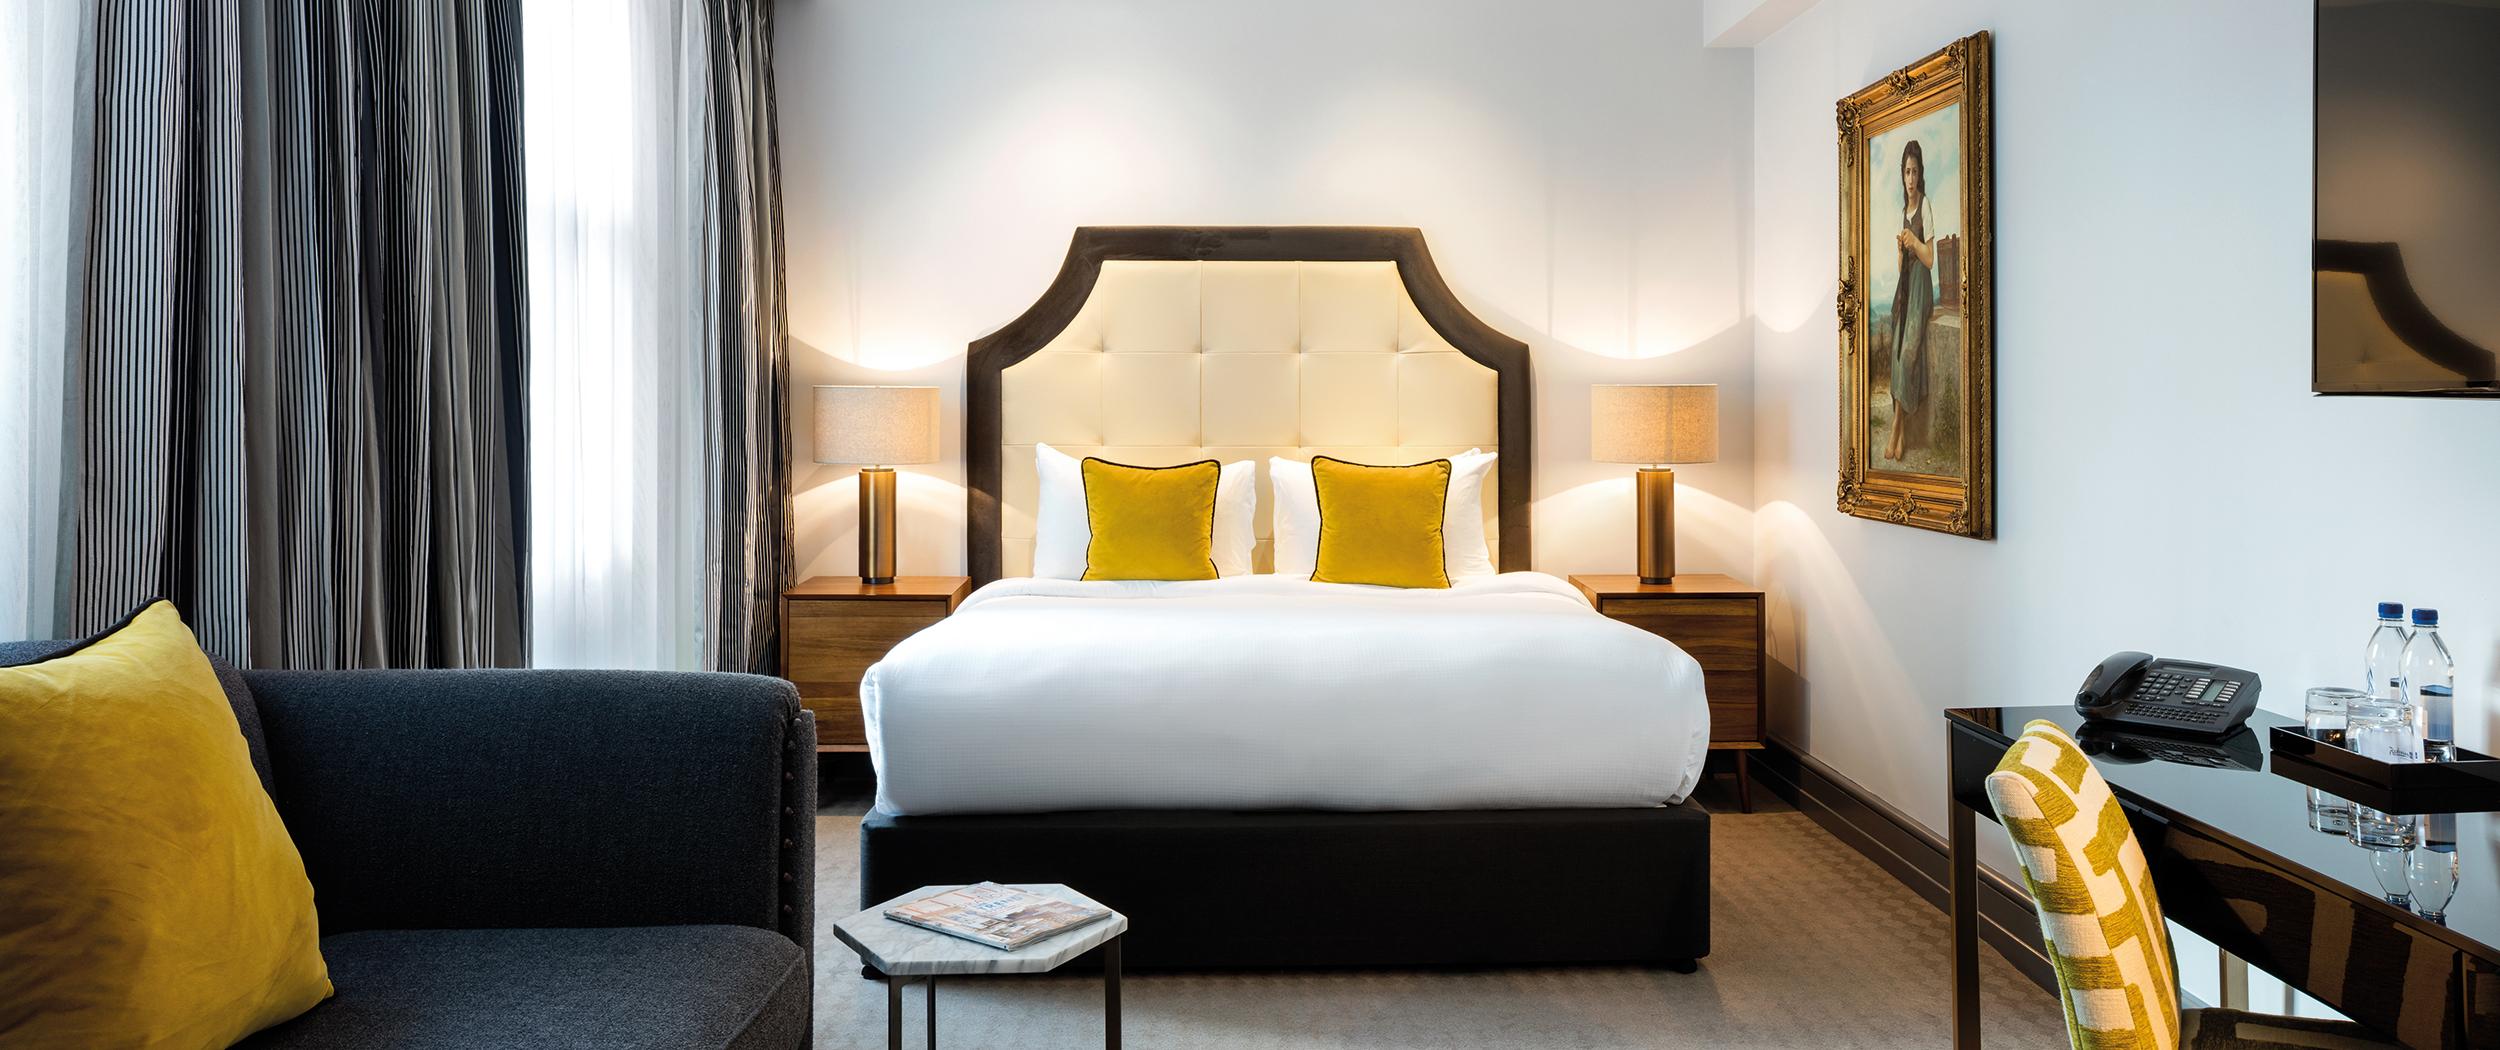 Vanderbilt bedroom.jpg